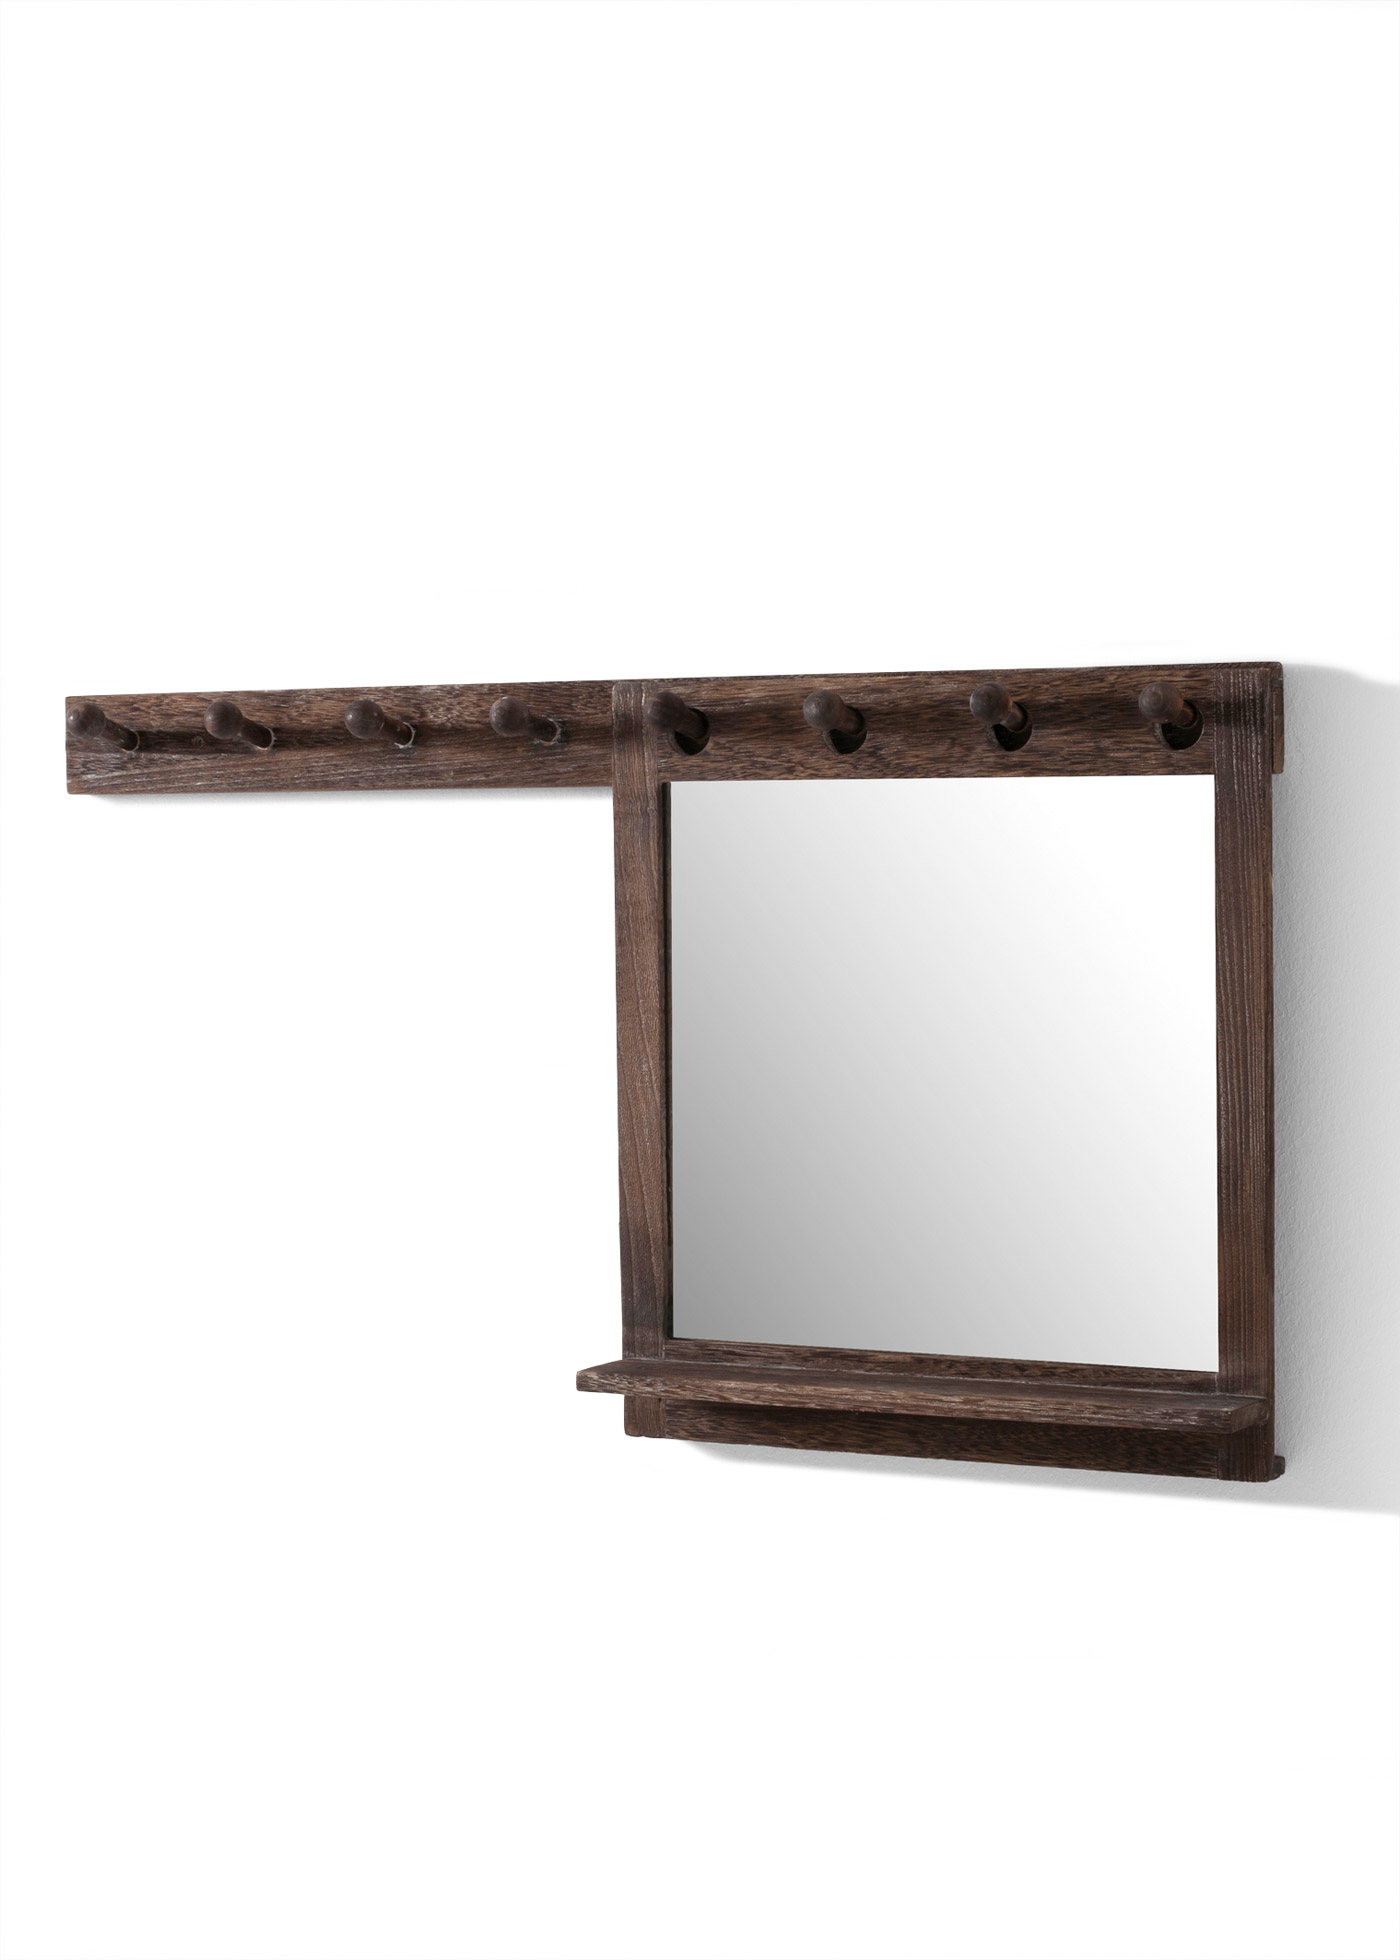 Idee kapstok spinder : Spiegel met kapstok kopen? : Online Internetwinkel